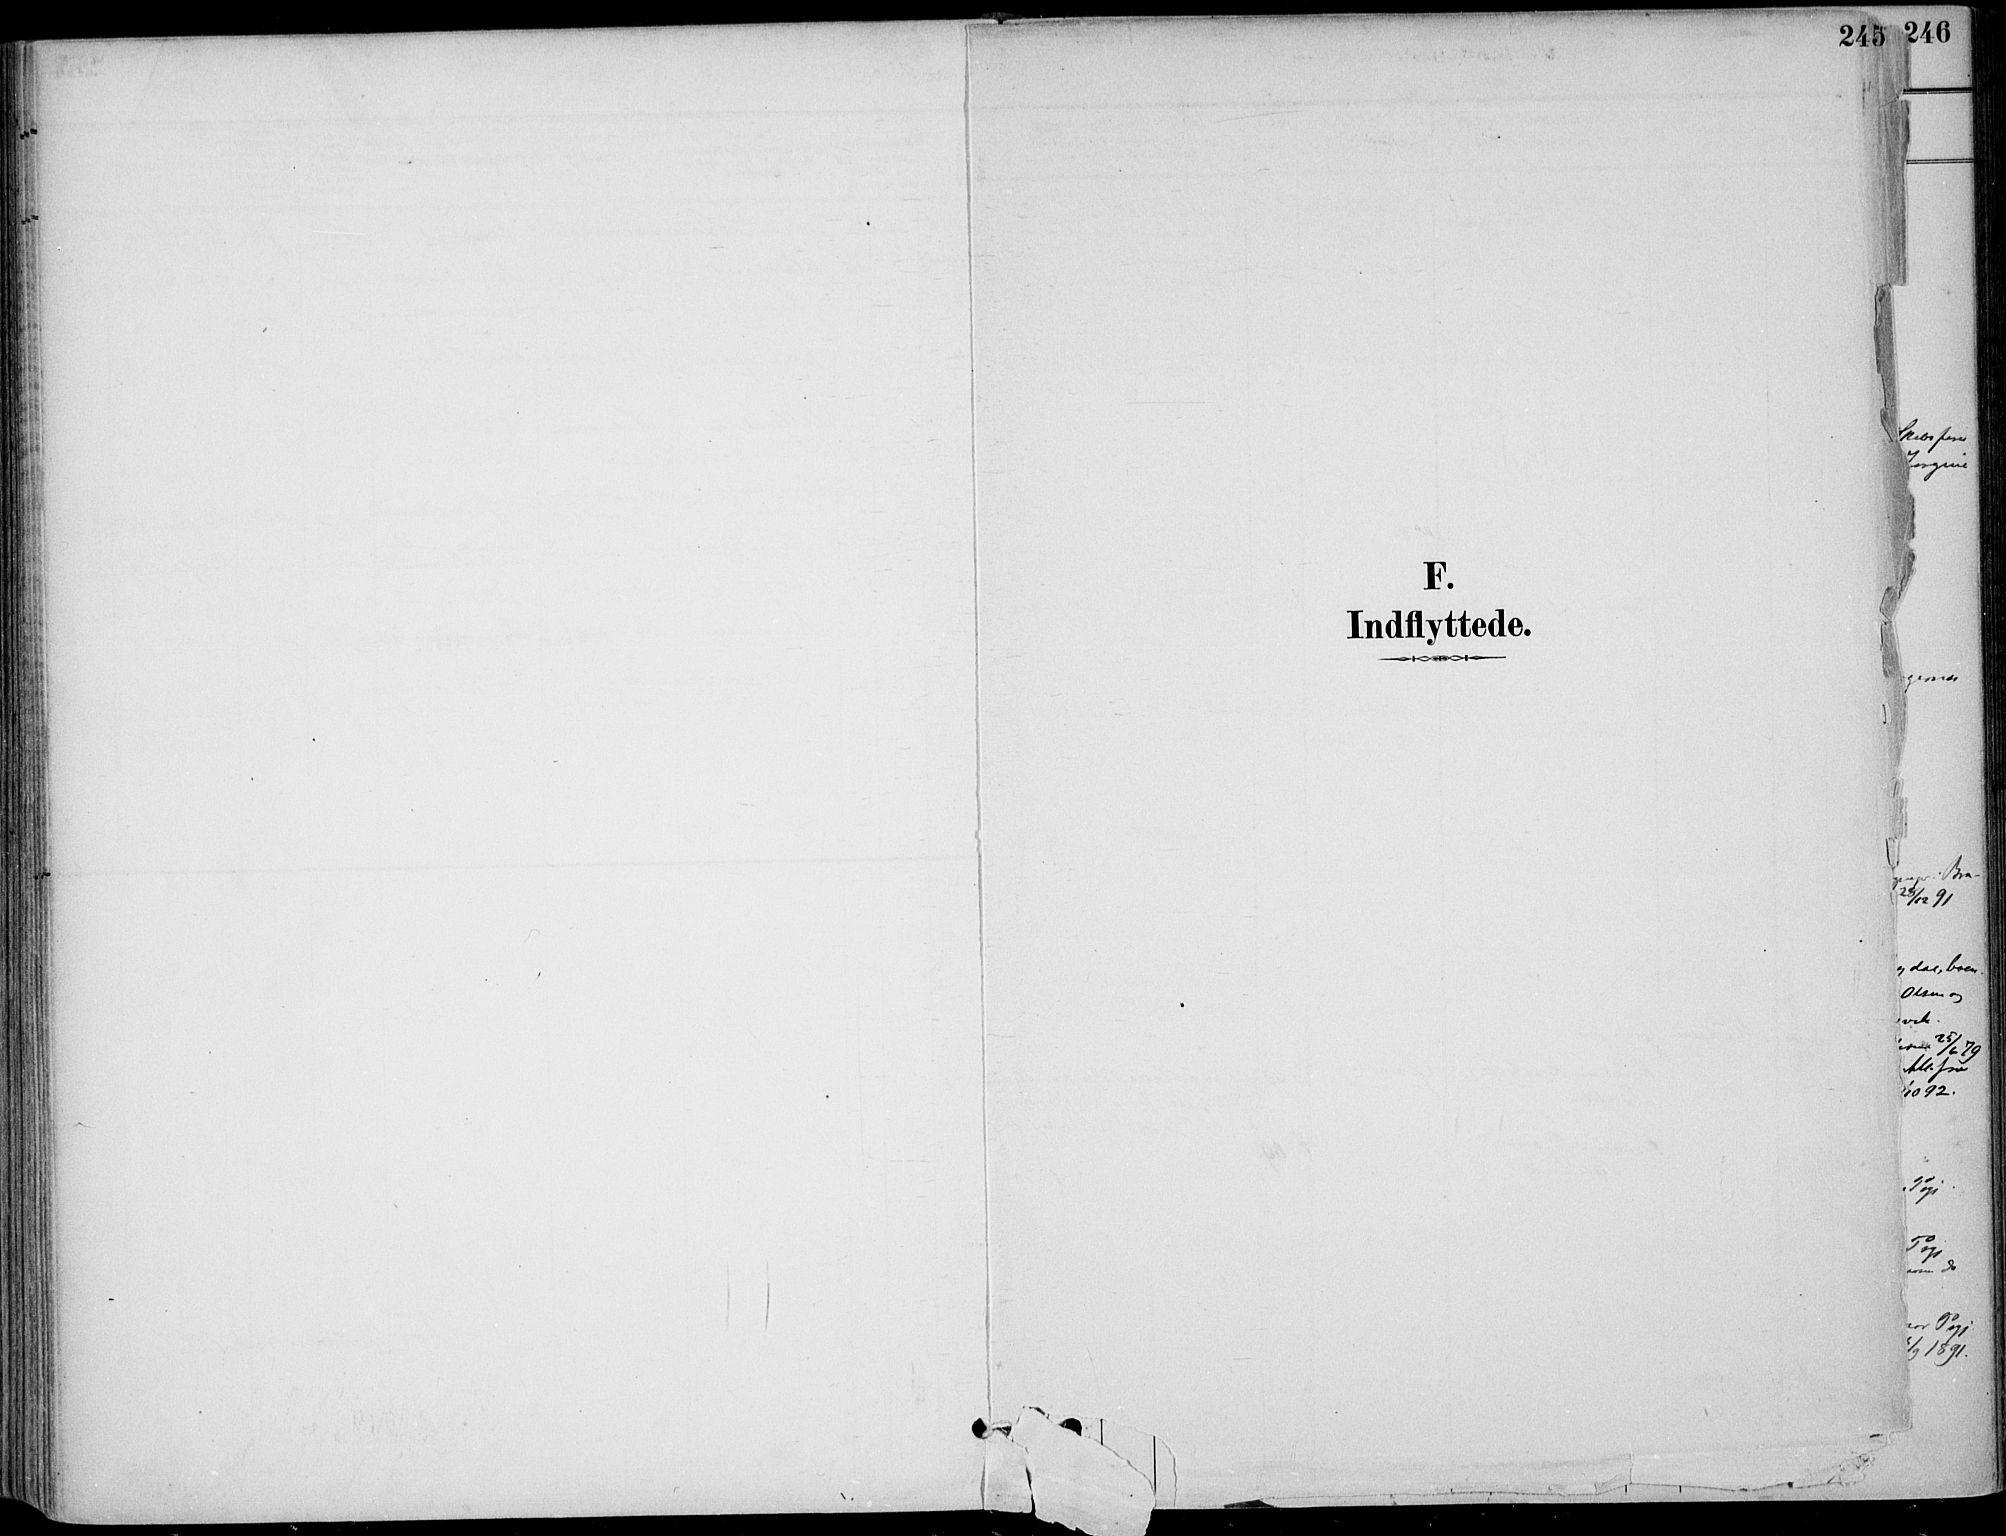 SAKO, Sigdal kirkebøker, F/Fb/L0001: Ministerialbok nr. II 1, 1888-1900, s. 245